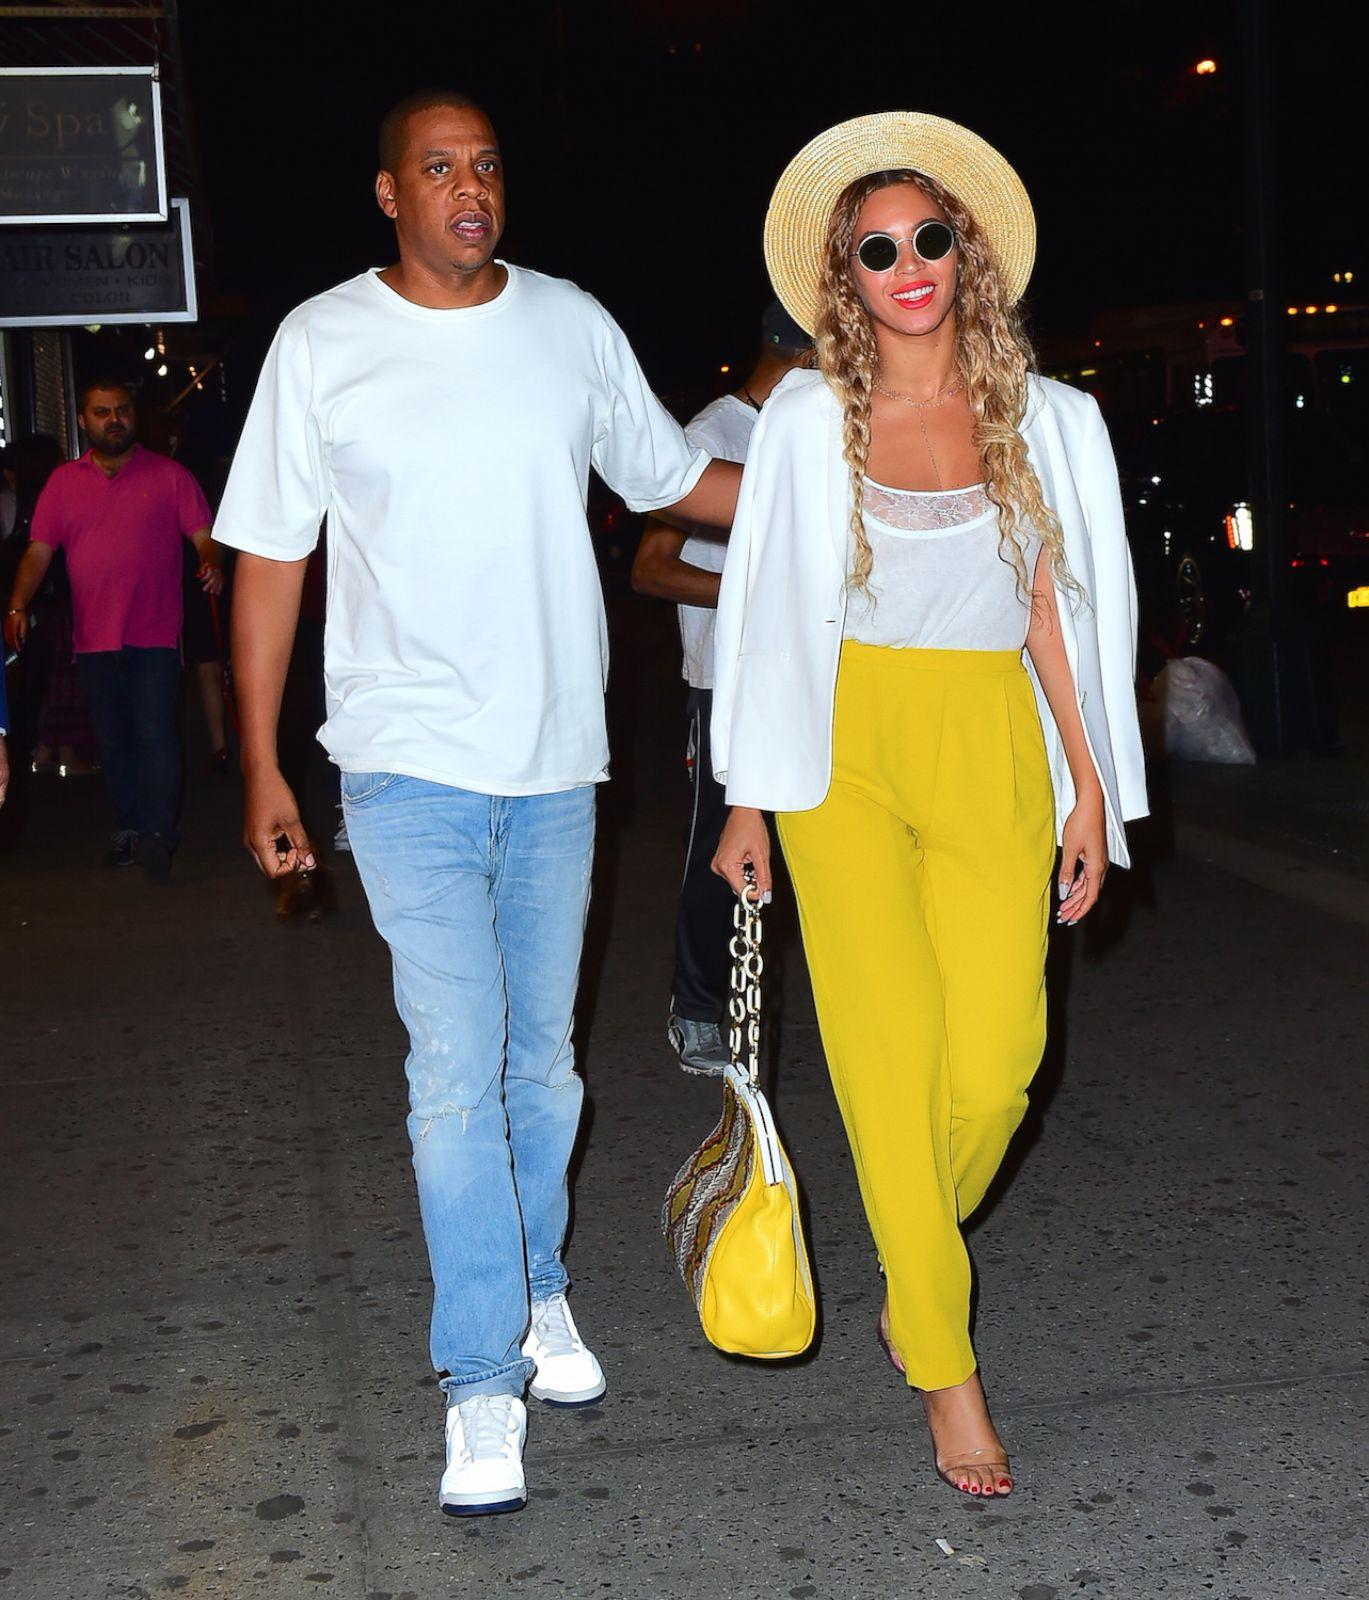 The NYC Designer Beyoncé Wore in Lemonade The NYC Designer Beyoncé Wore in Lemonade new pictures